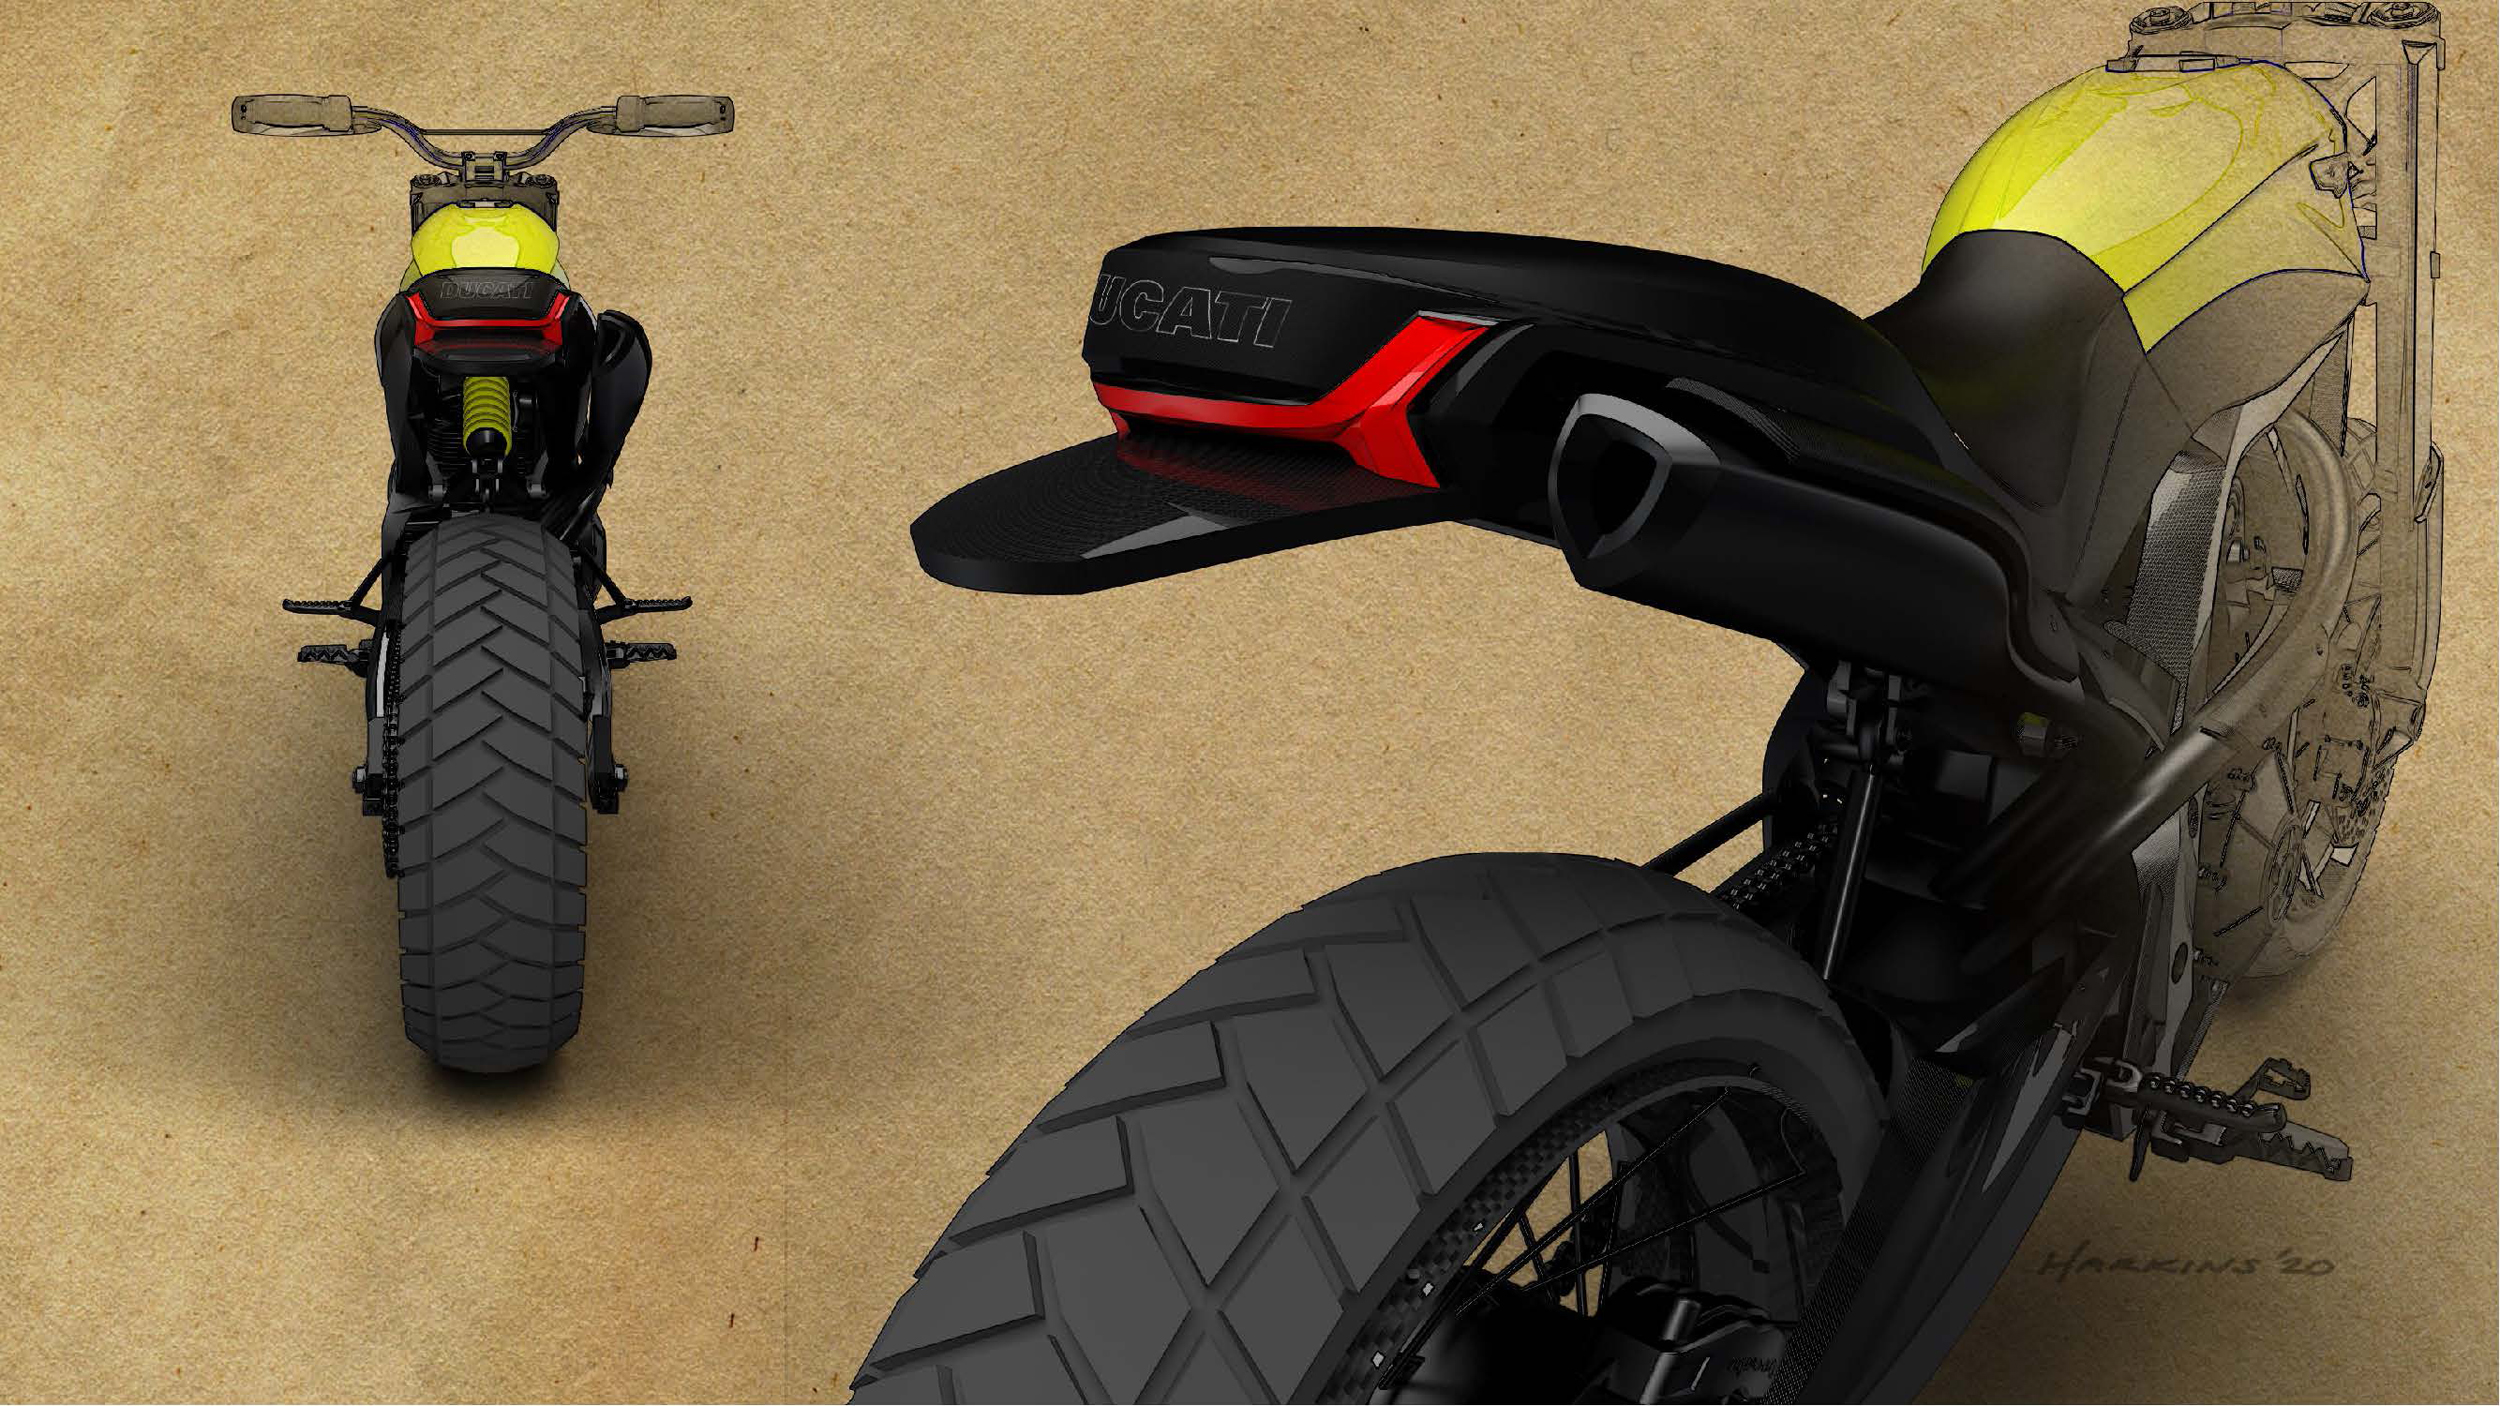 200511 Scrambler Ducati of the future - sketches by Peter Harkins (6)